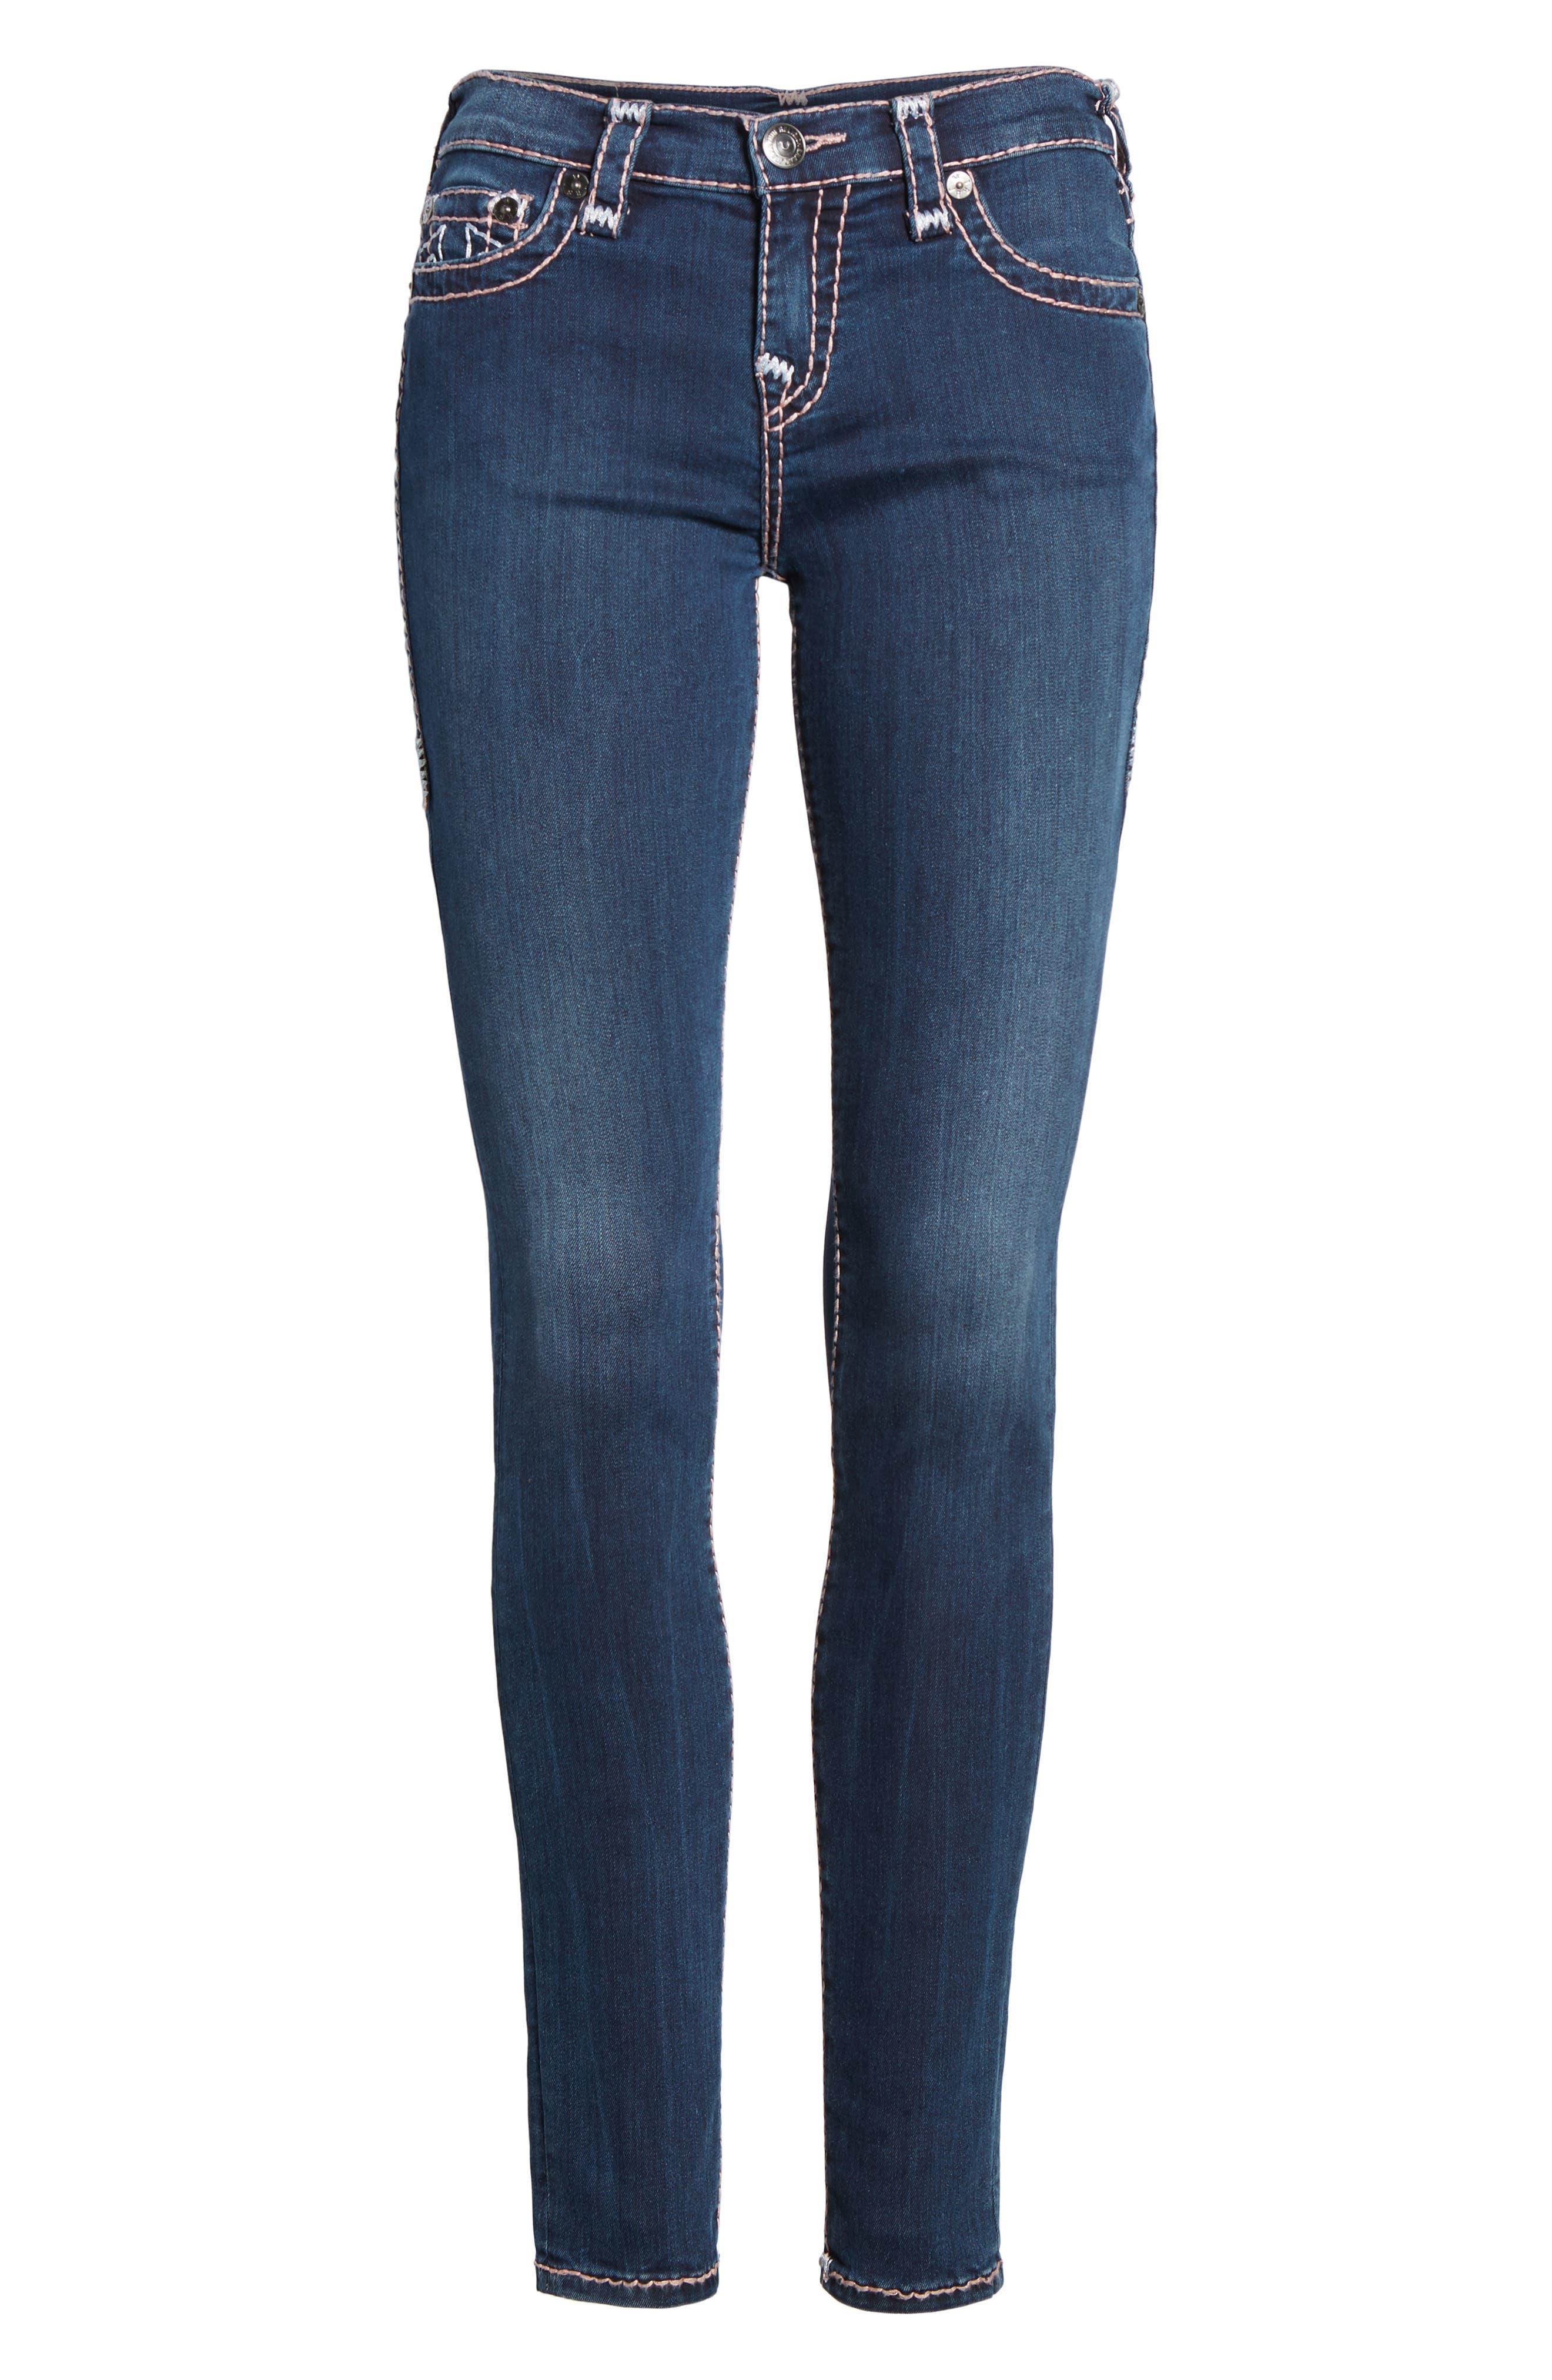 Halle Super Skinny Jeans,                             Alternate thumbnail 7, color,                             Deep Sea Blue